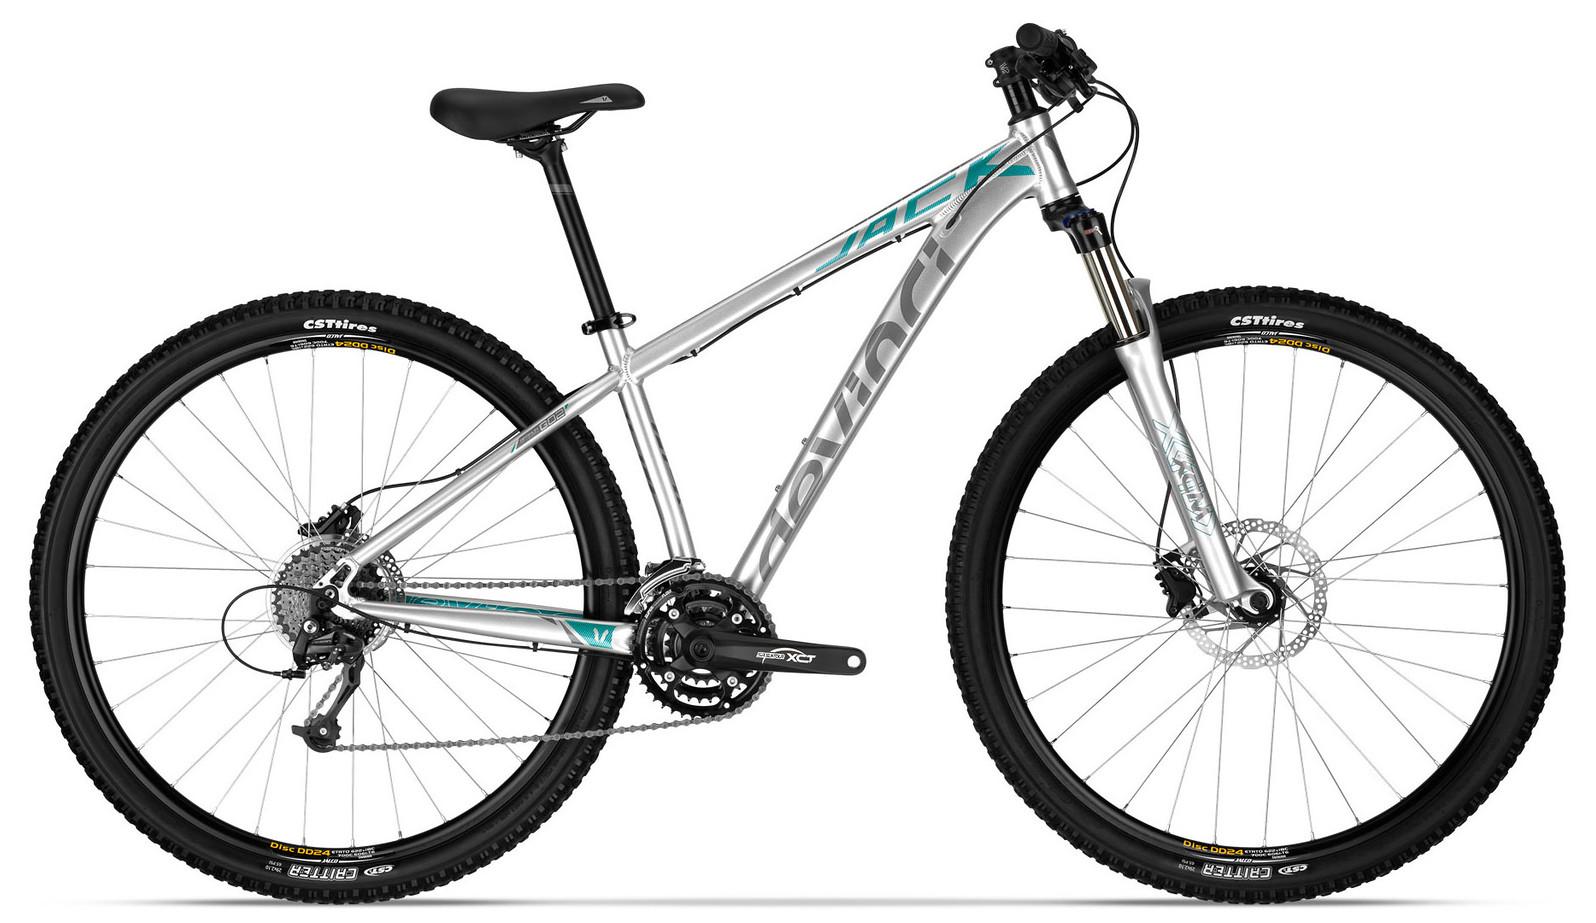 Bike - 2014 Devinci Jack RC WF